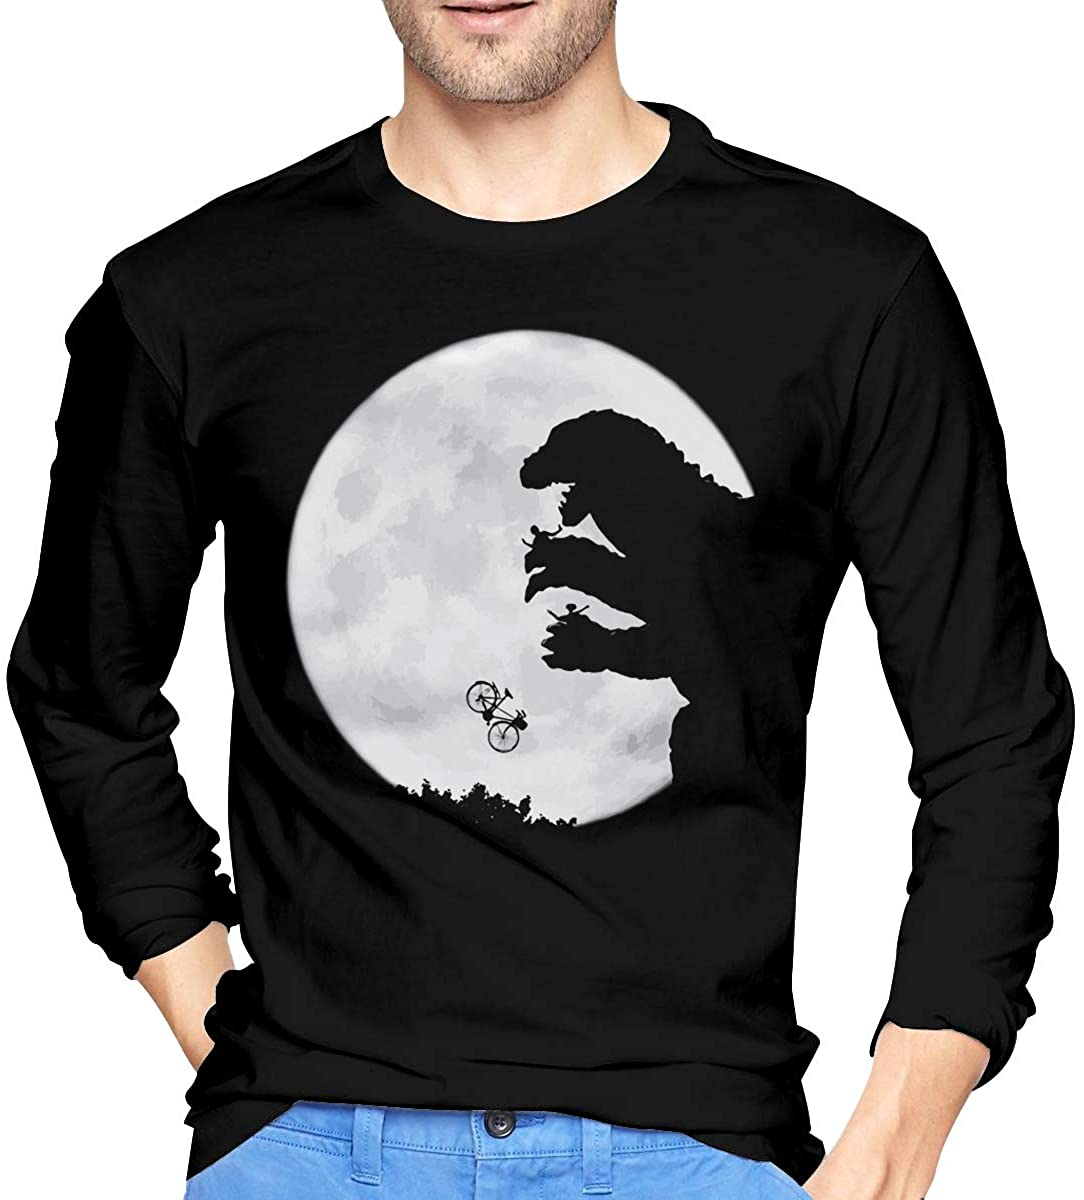 Men's Godzilla T Shirt Cool Long Sleeve T-Shirts Black